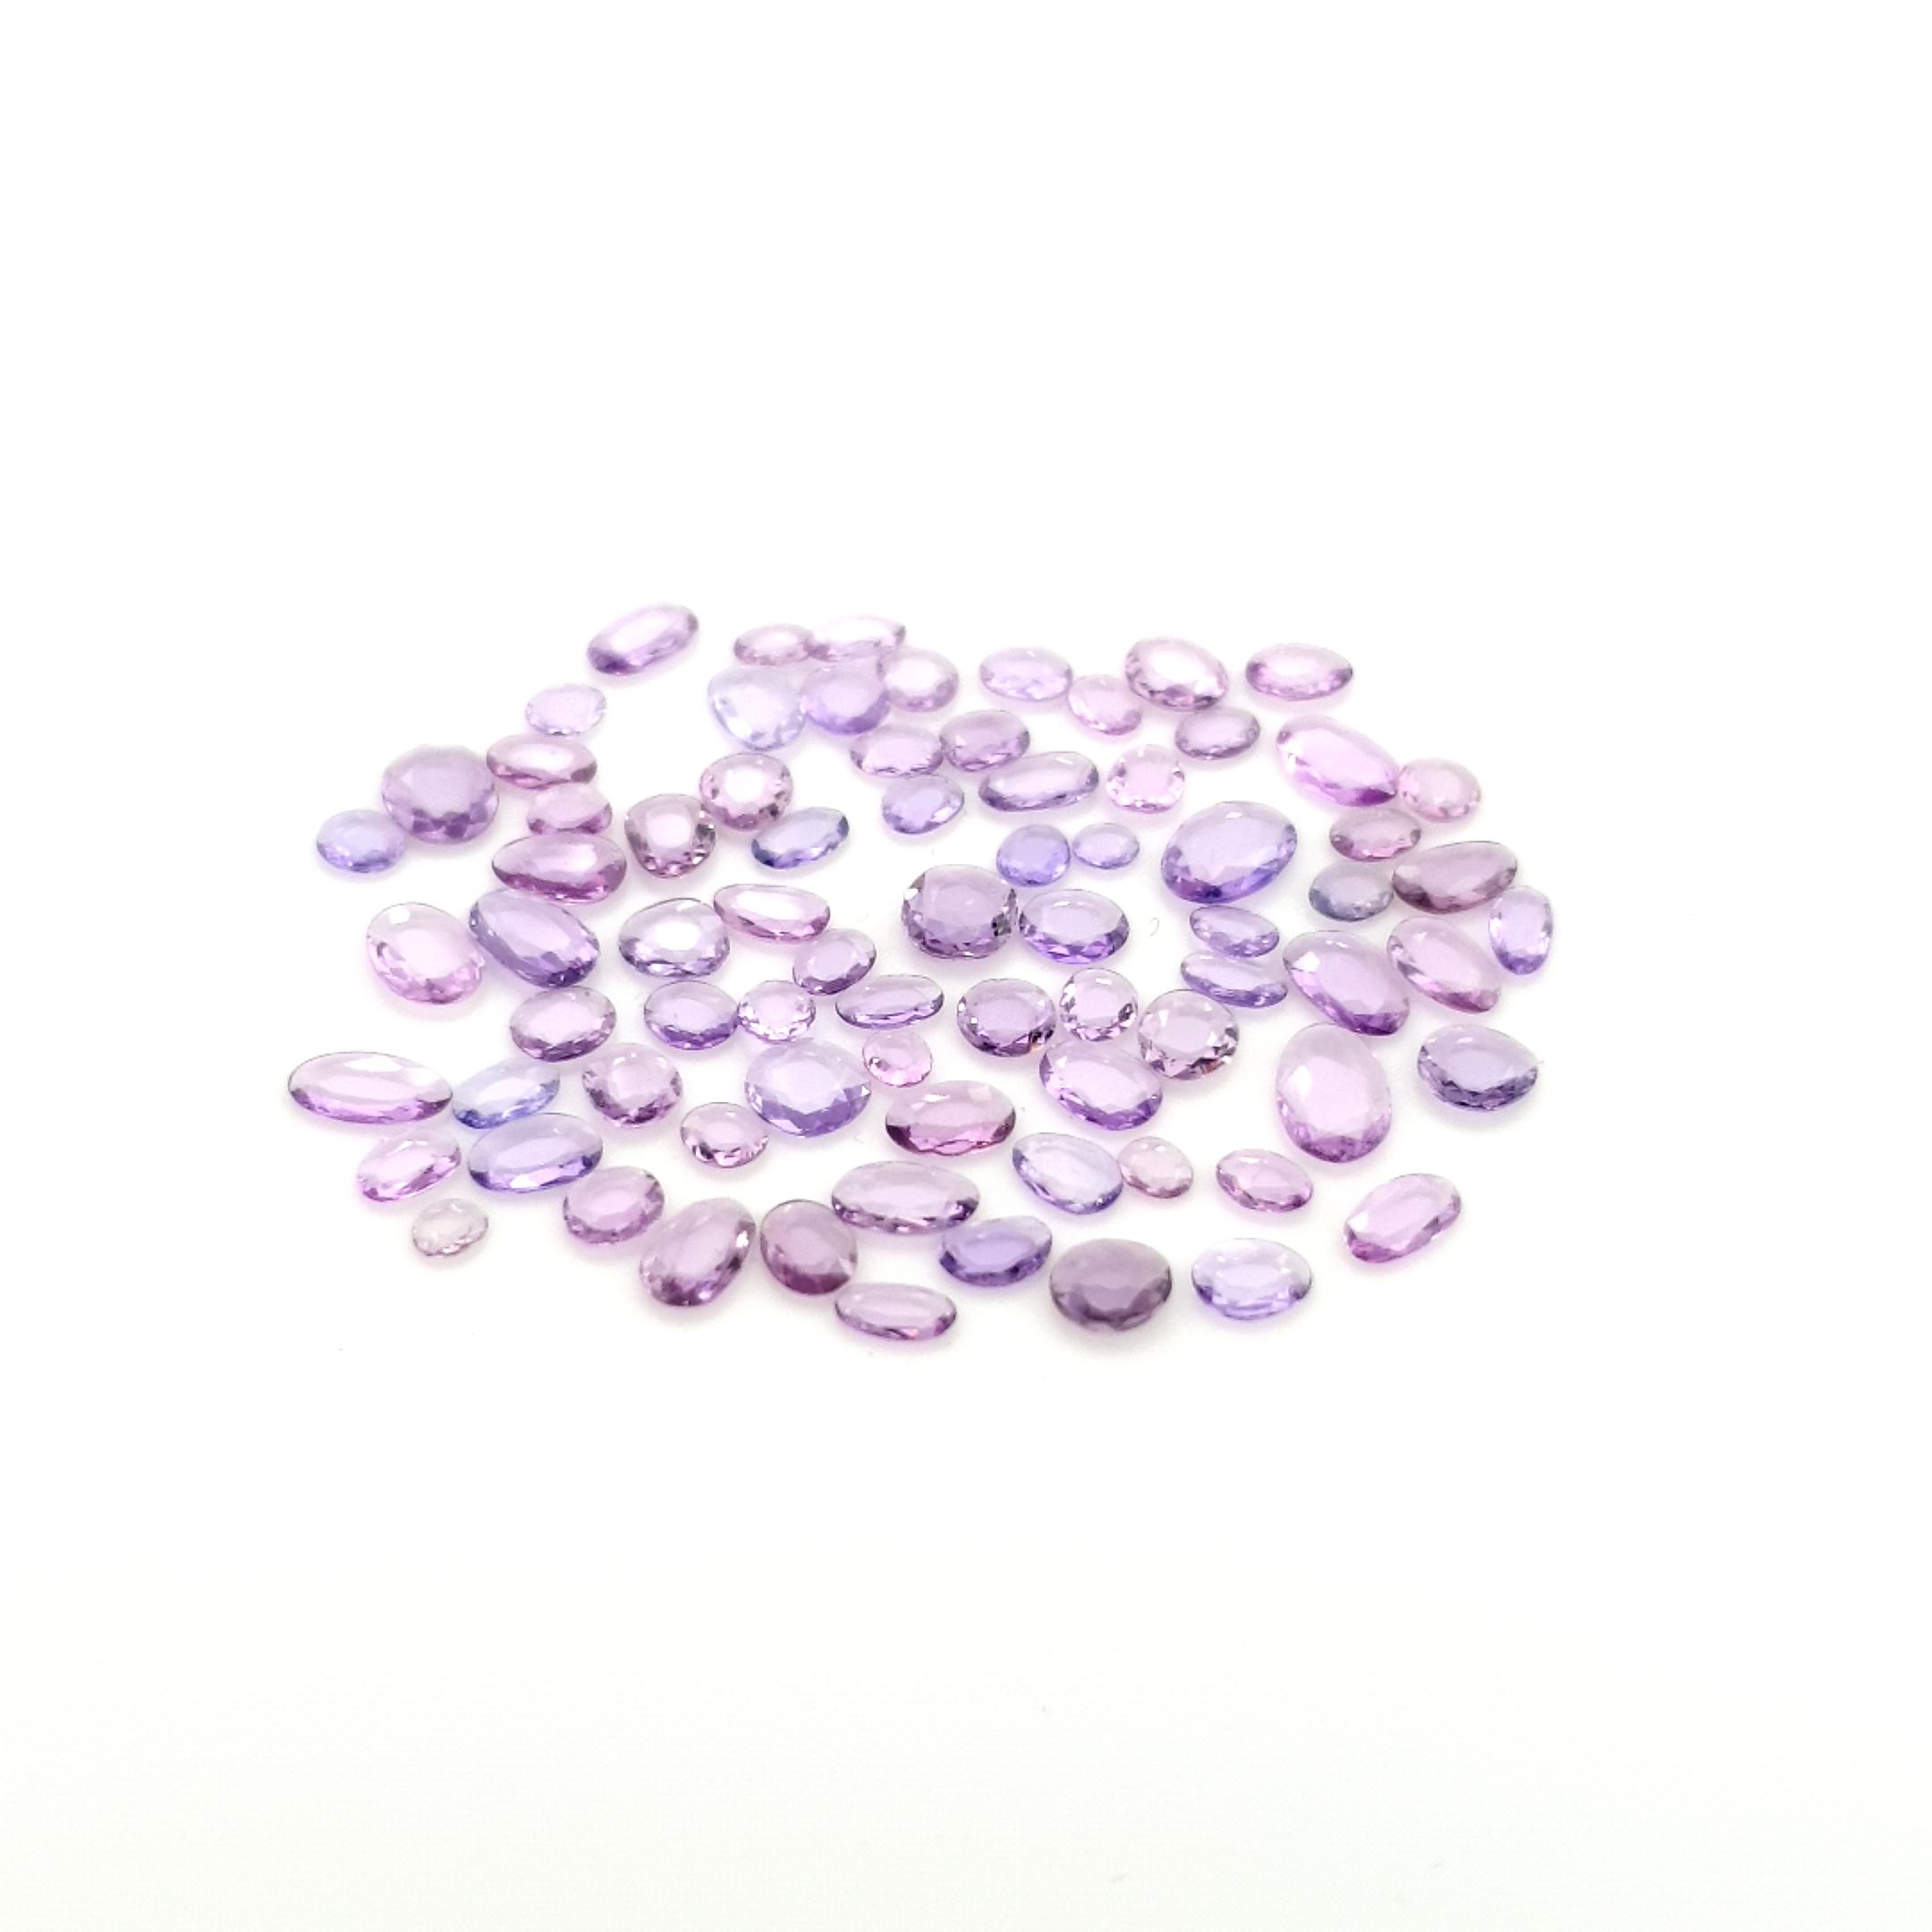 0-0,3ct.size-VioletPurpleSAPPHIRE-DoubleRoseCut-ClaudiaHamannEdelstein__2021-01-26-18-07-34